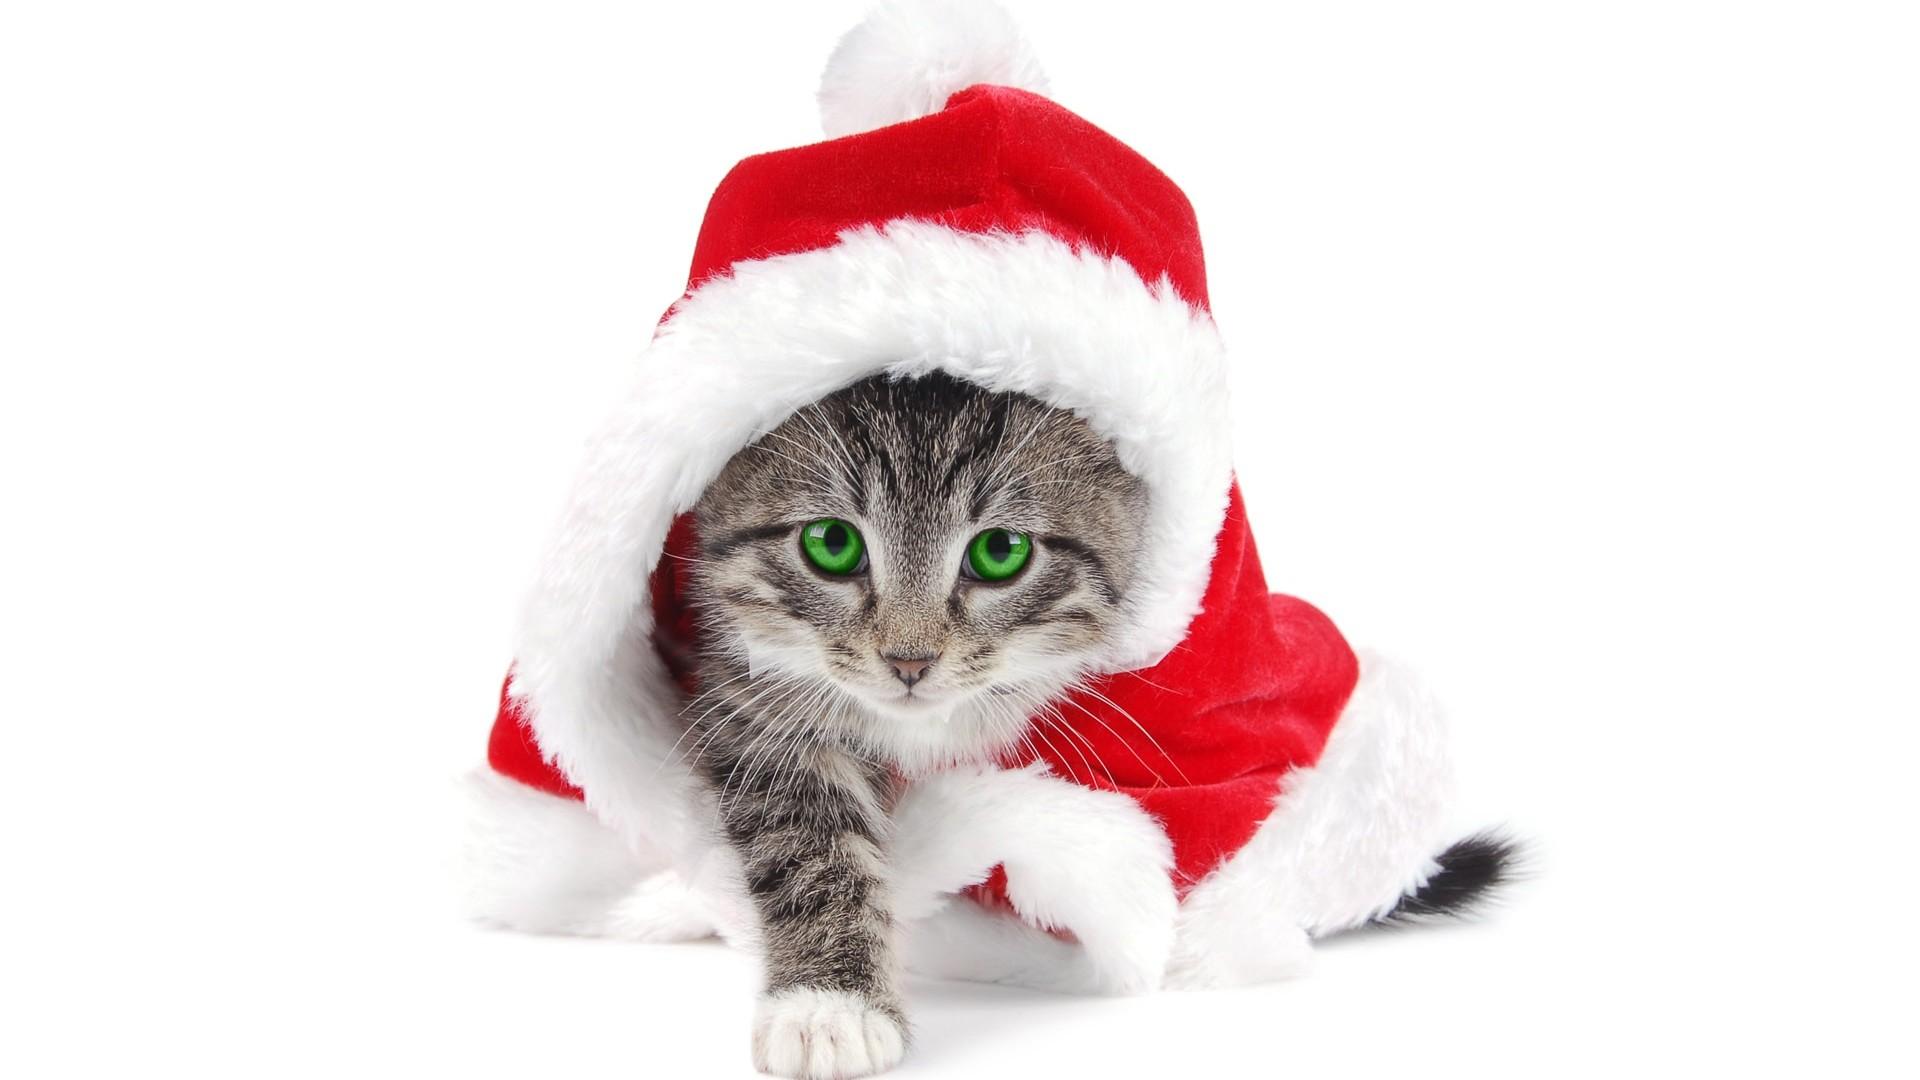 Cute Baby Cat Christmas Wallpaper Free Downloa #11467 Wallpaper